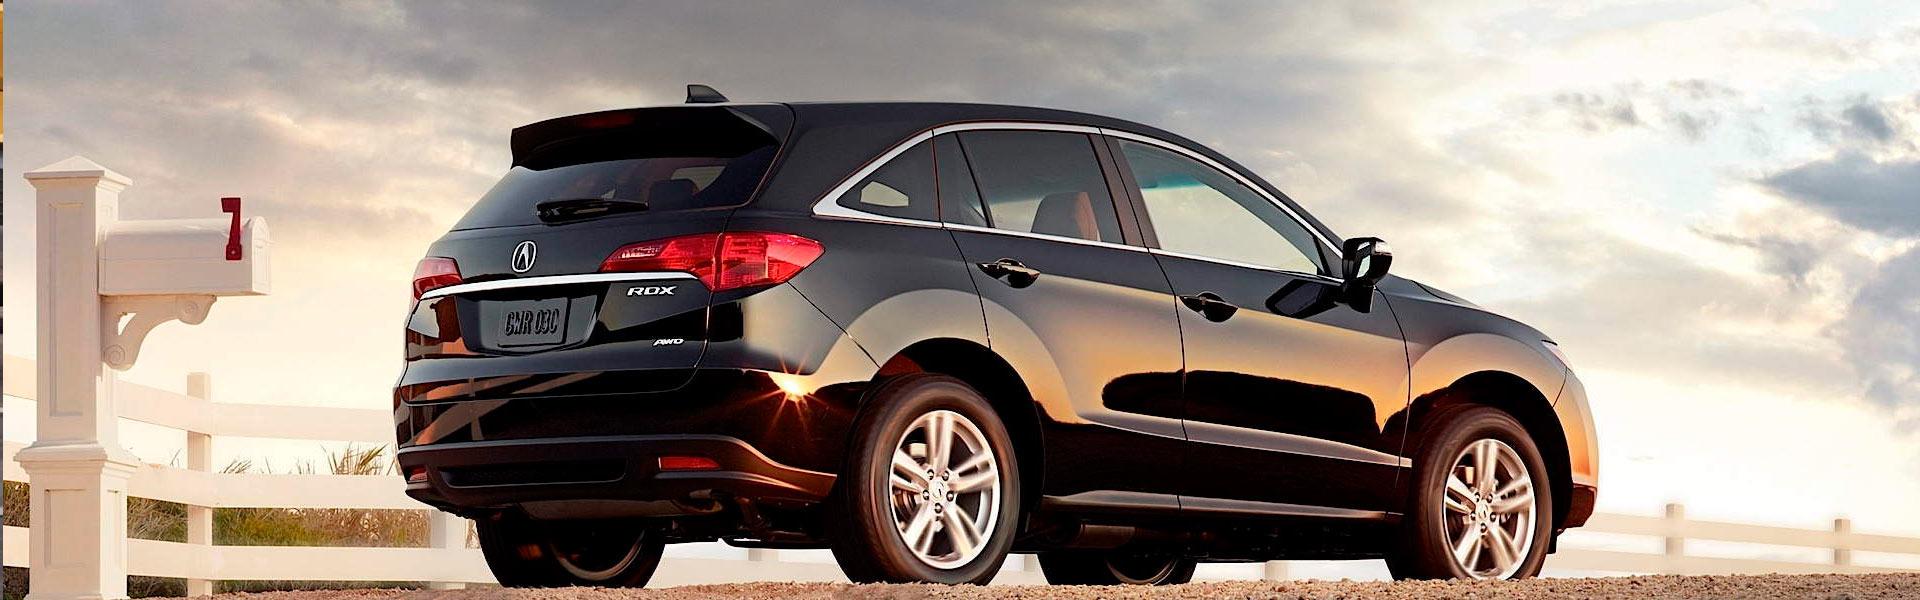 Шиномонтаж Acura RDX